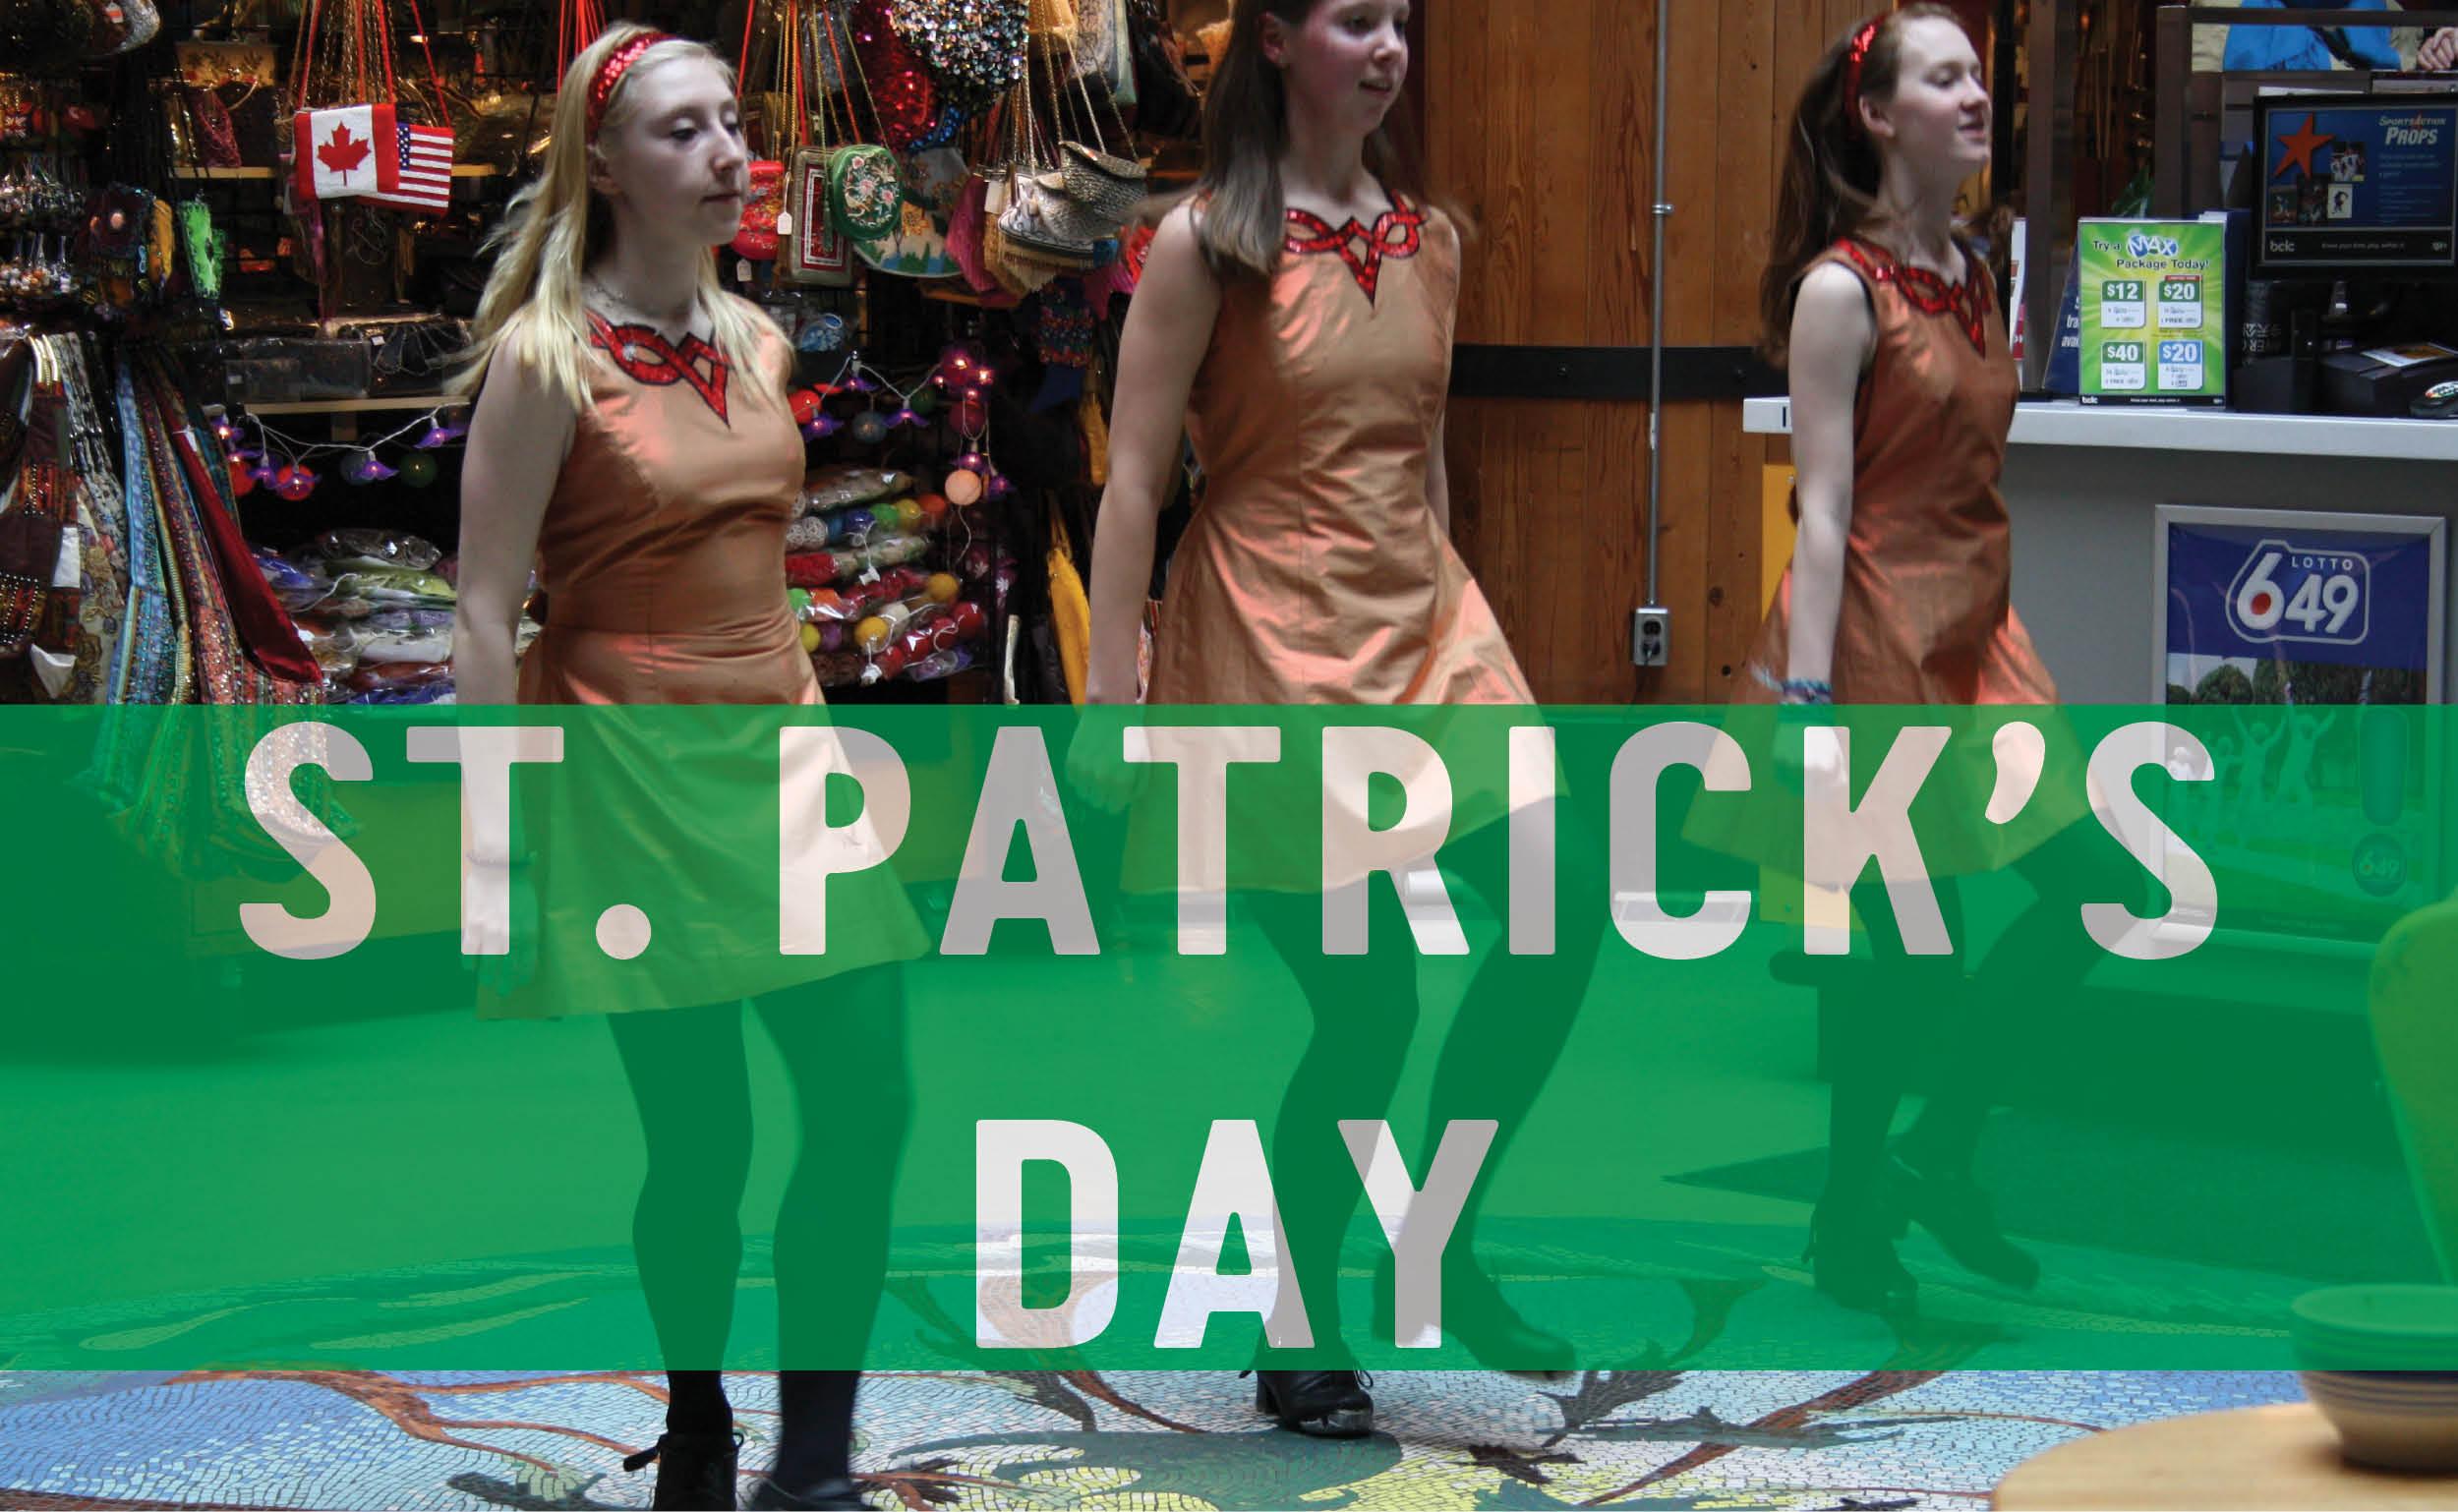 Celebrate St. Patrick's Day at Lonsdale Quay Market